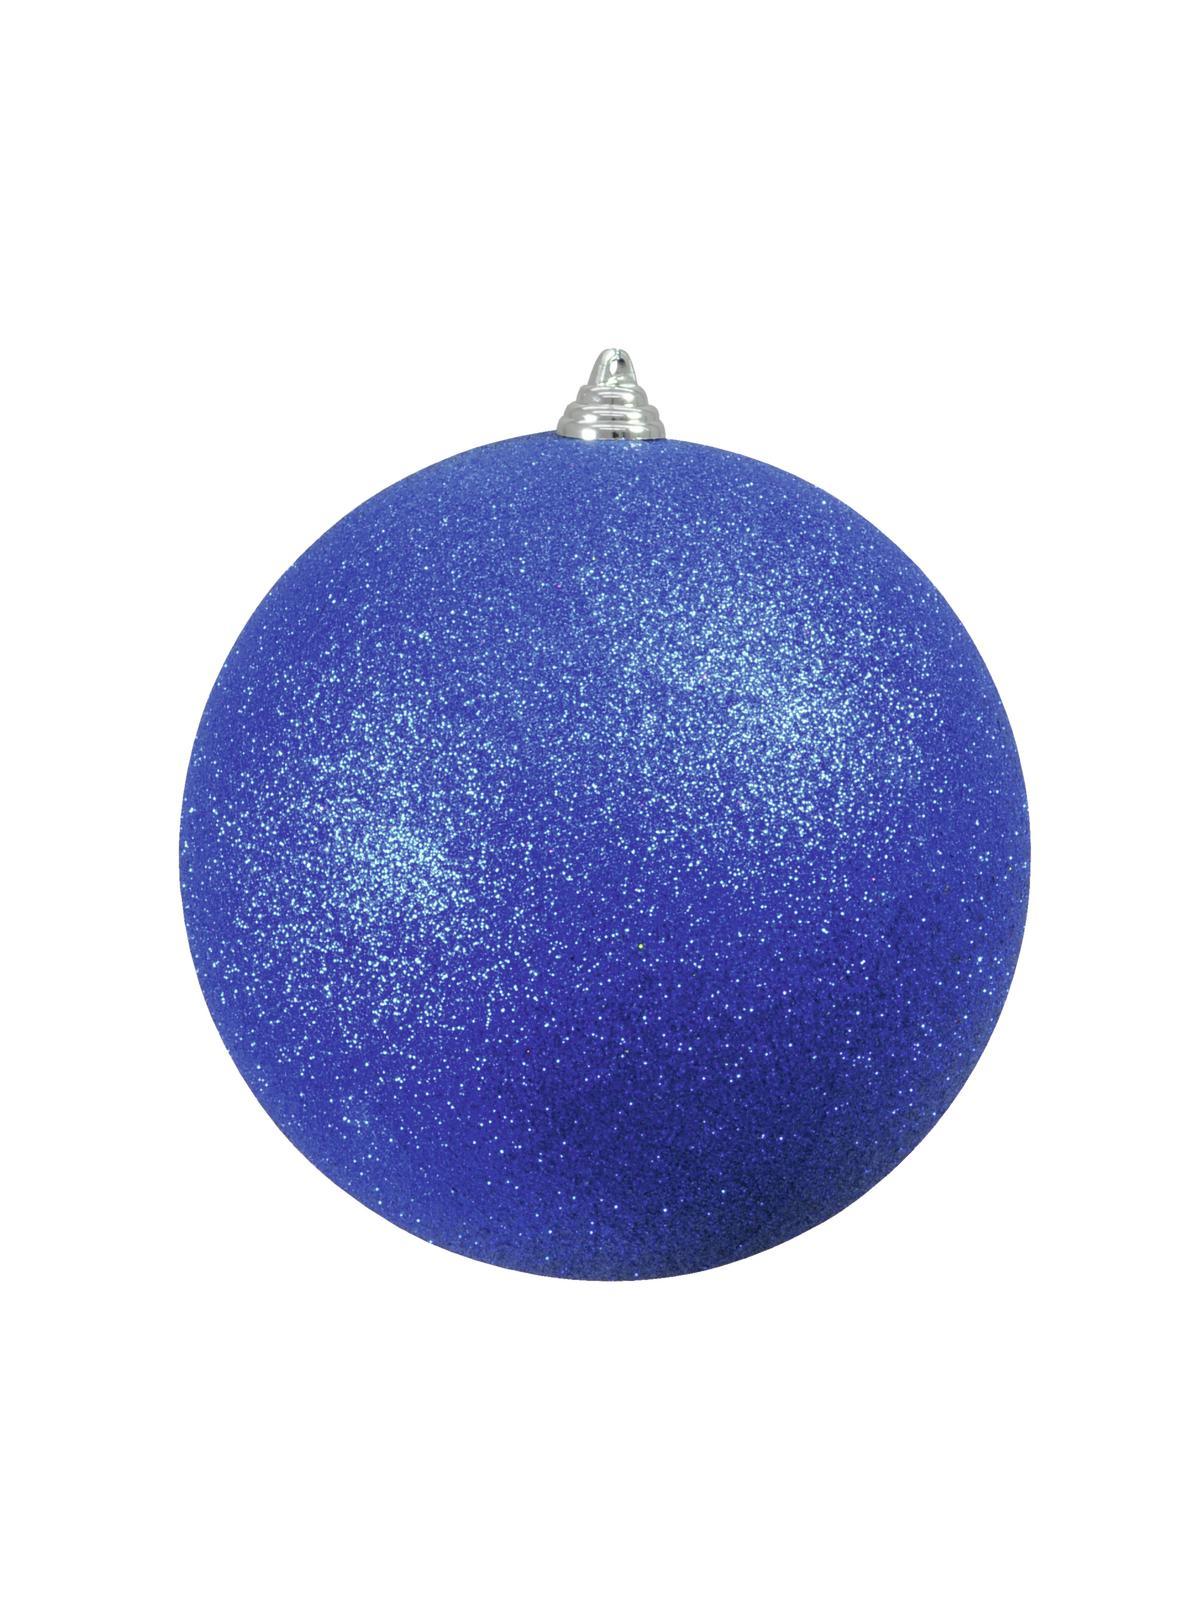 Balls Balls christmas Plastic 20Cm for Tree decoration 4 pcs Blue Glitter